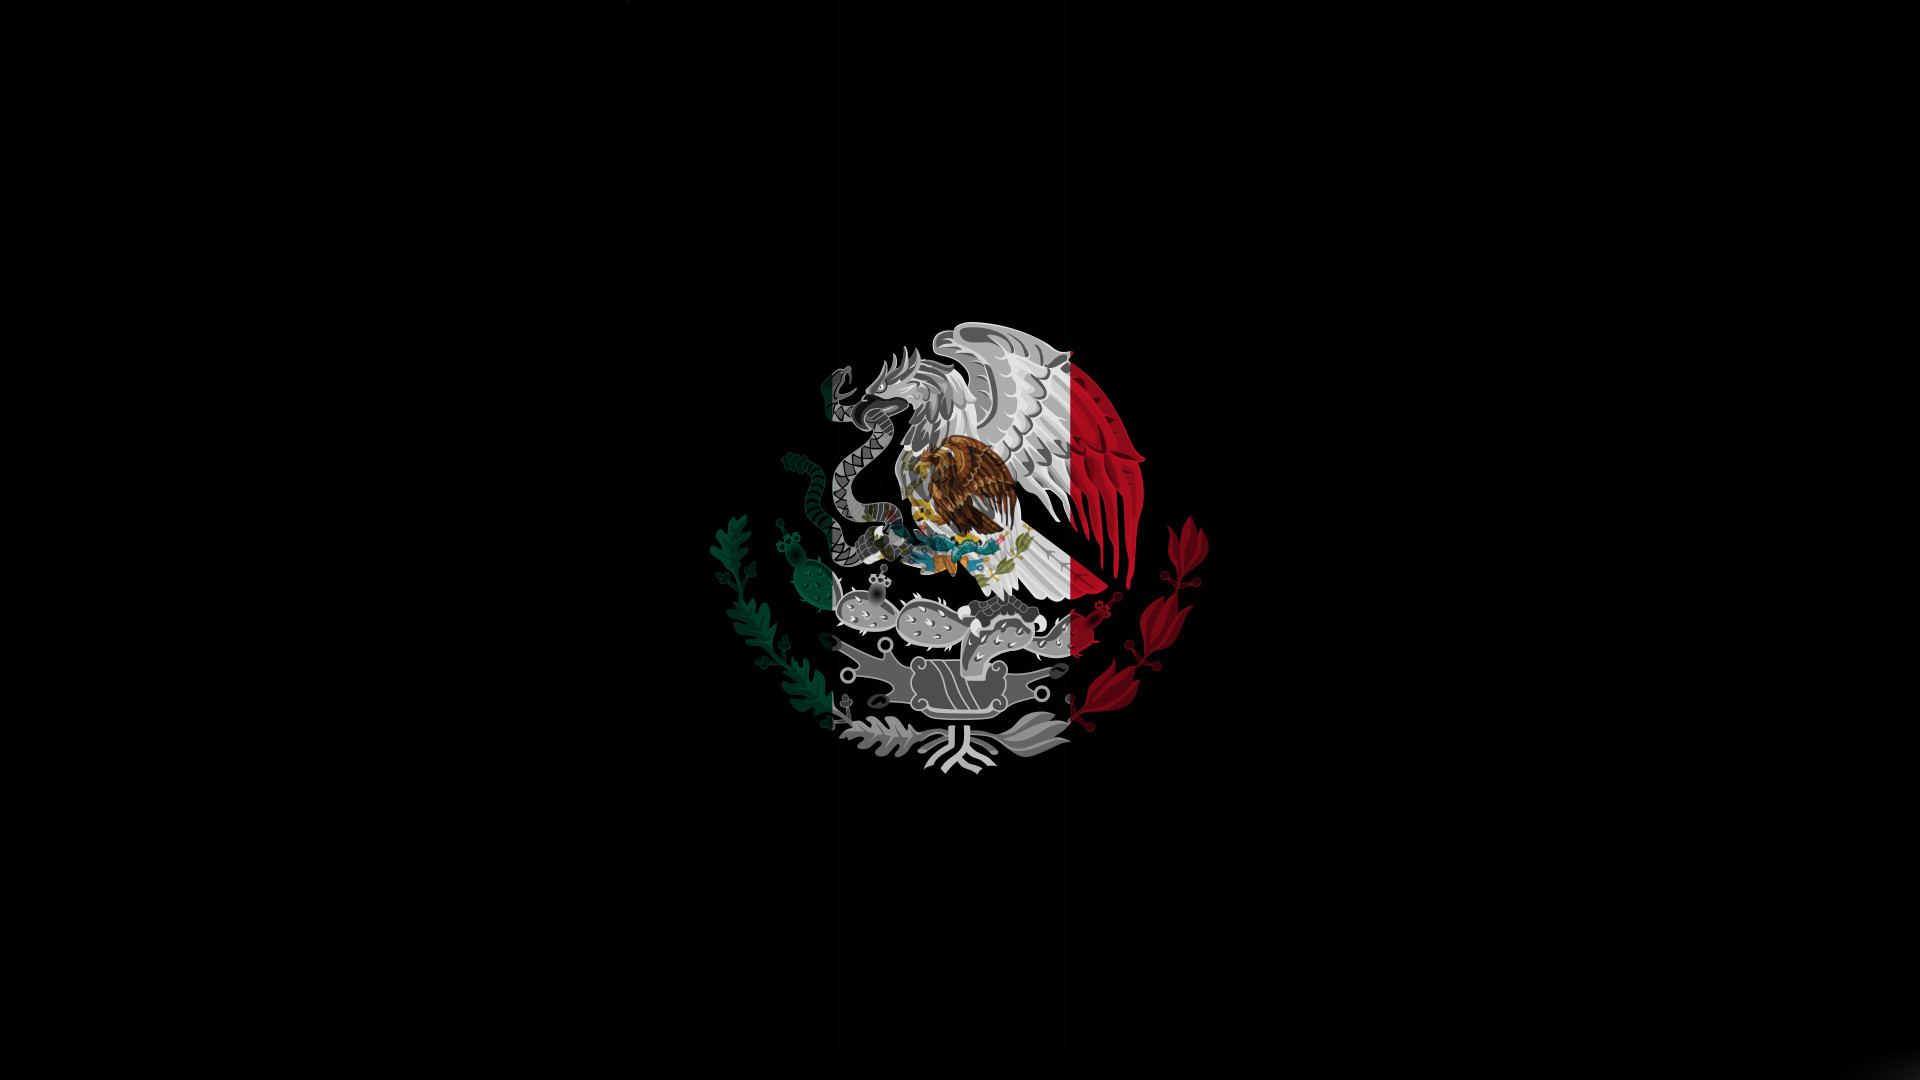 Computer Amazing Mexico Wallpapers, Desktop Backgrounds px